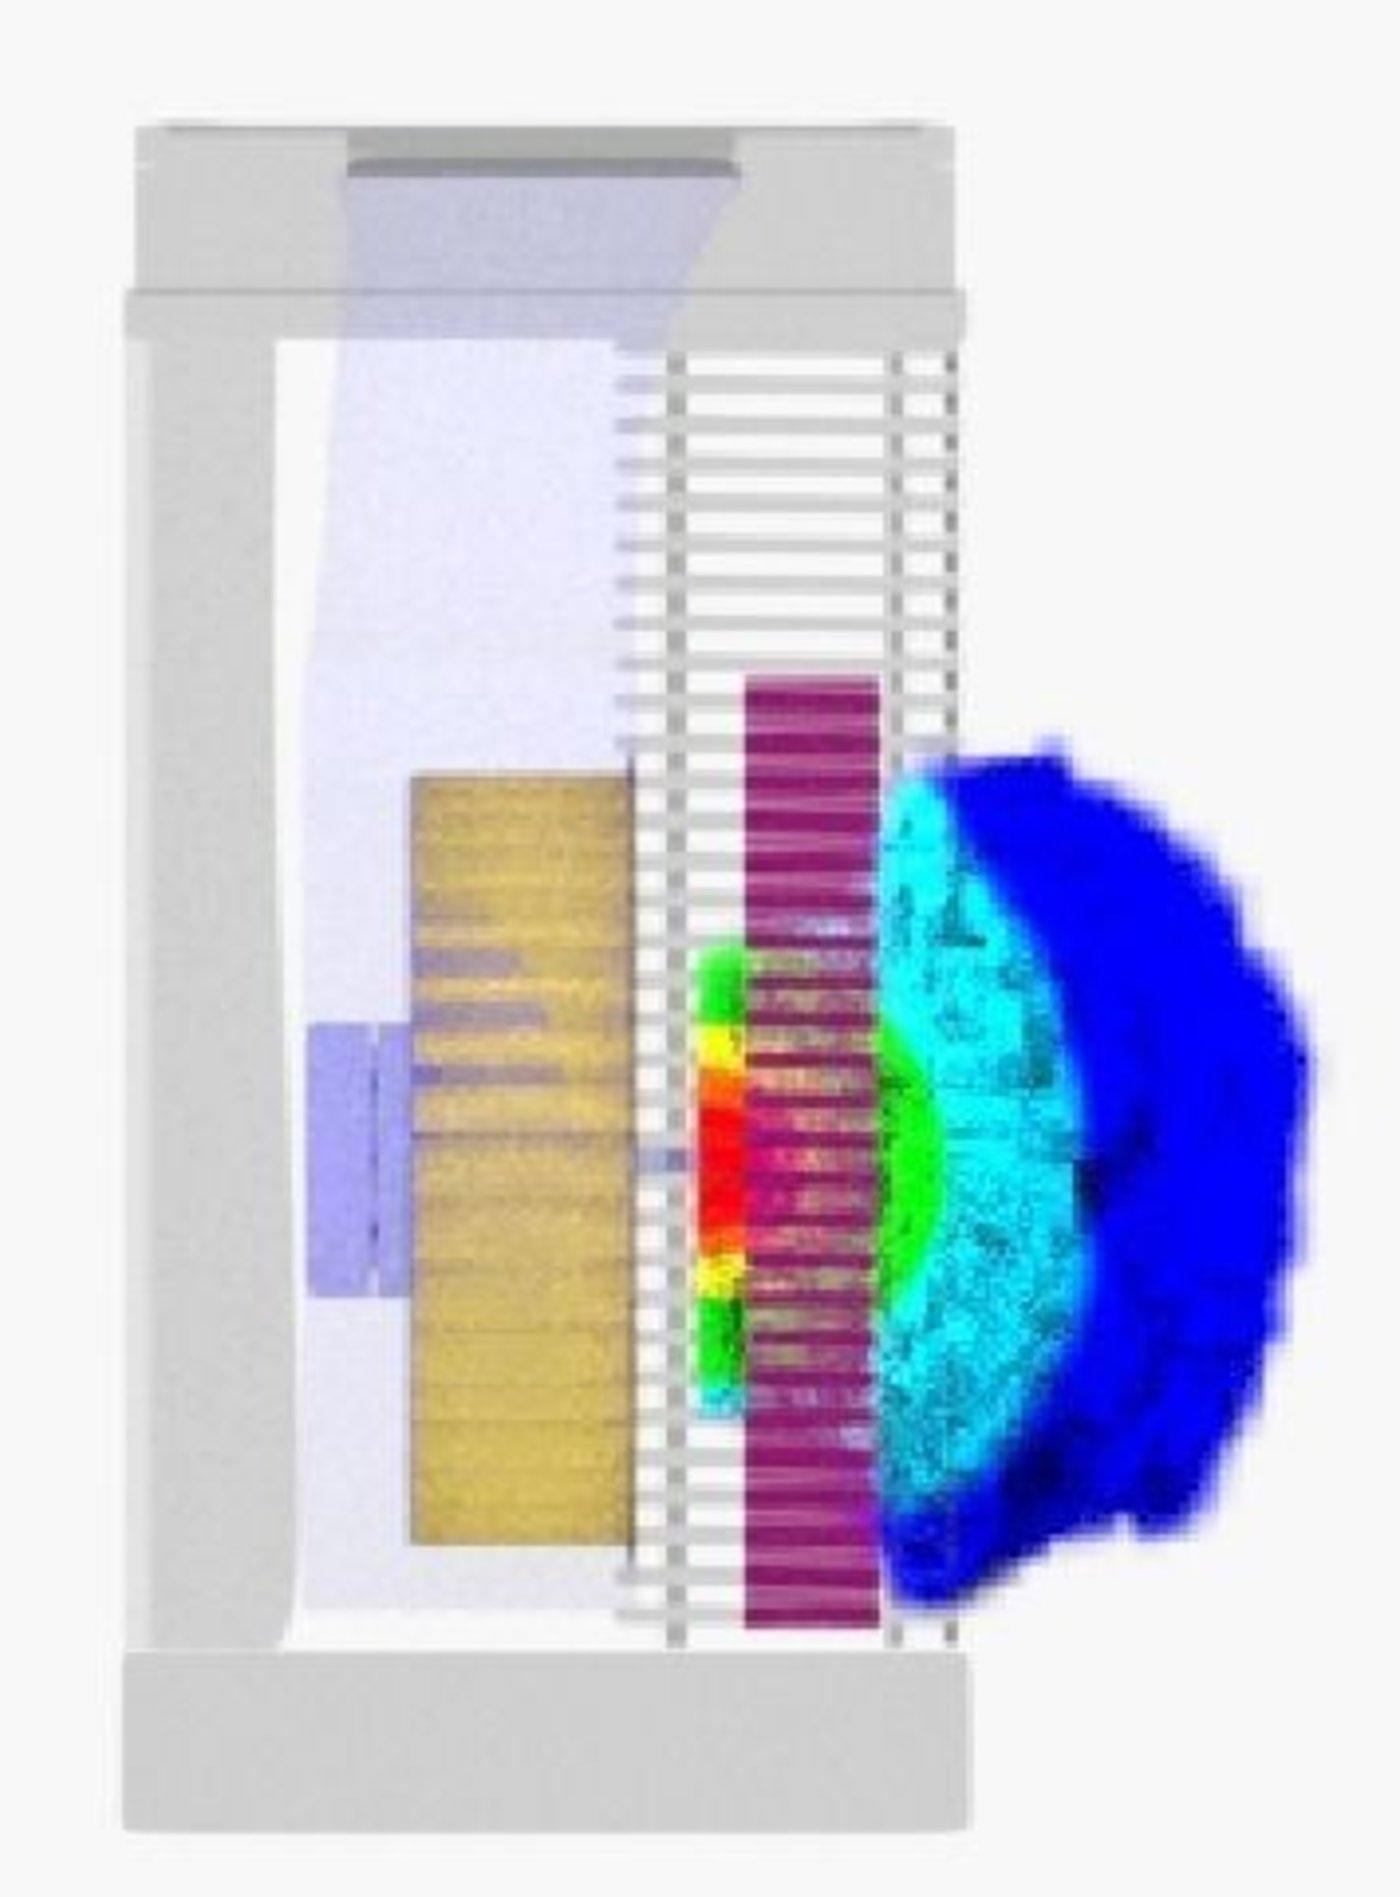 Air flow Visualization